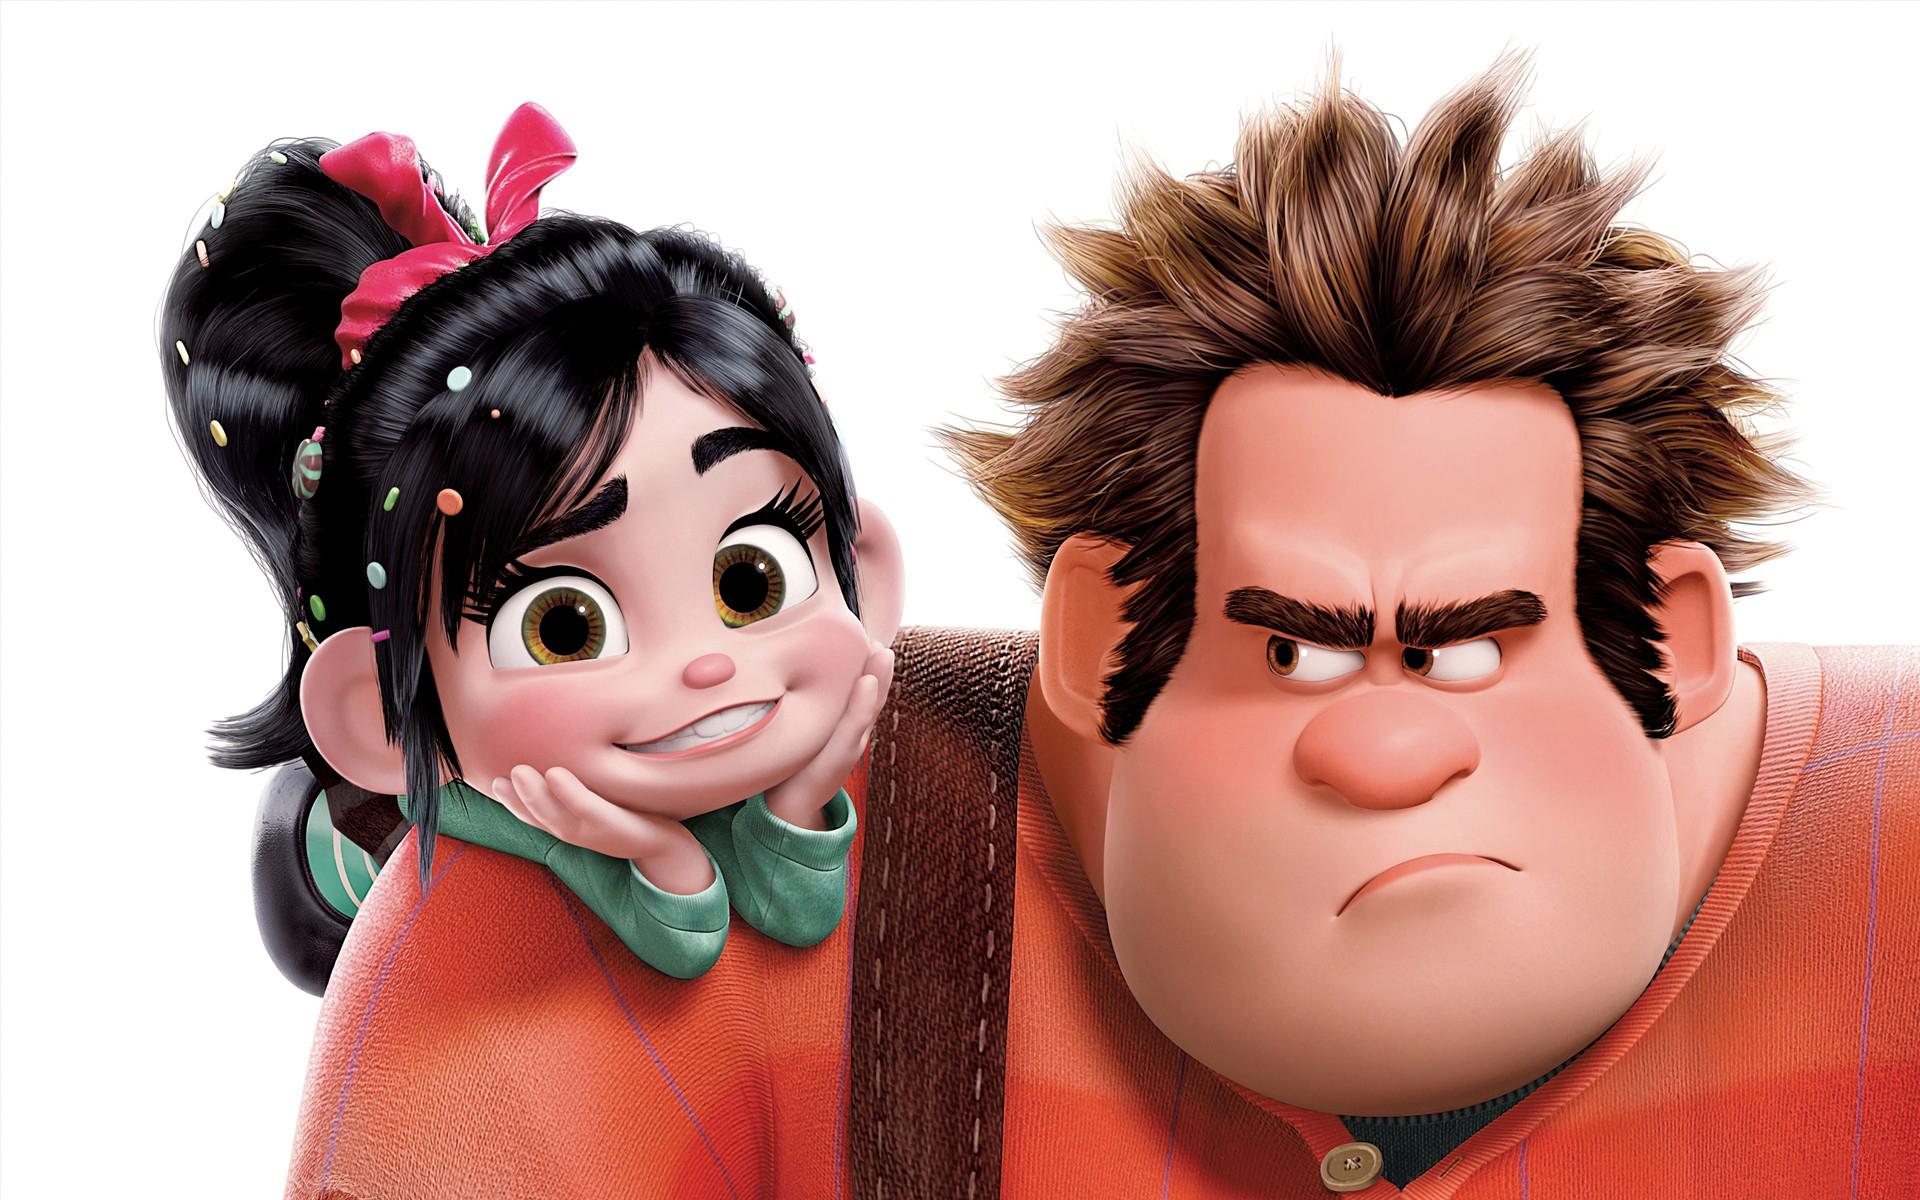 Disney Announce Wreck-It Ralph 2